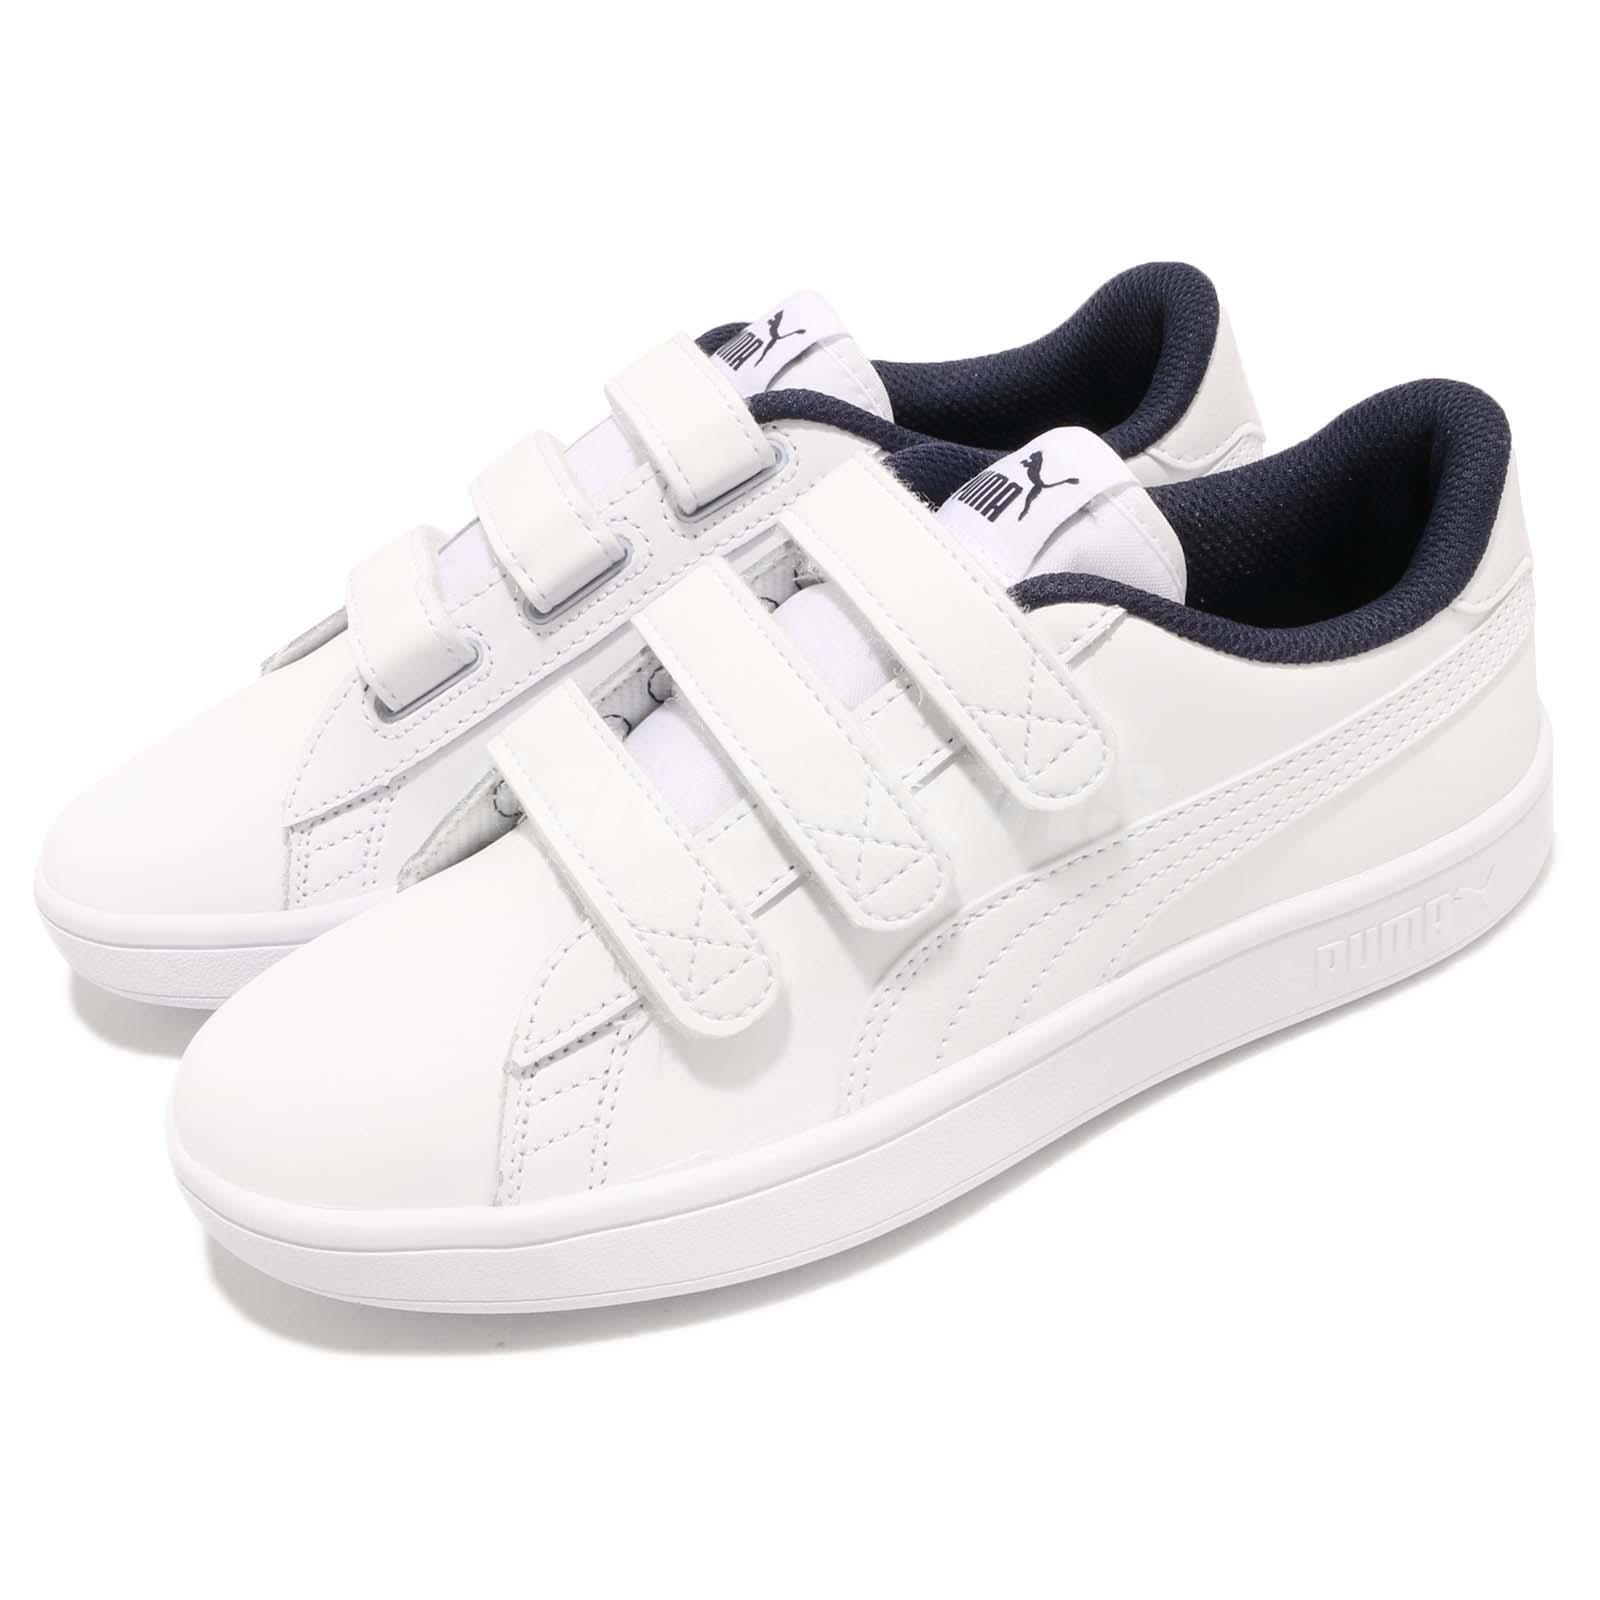 Puma Smash V2 V Strap Peacoat Navy White Men Casual shoes Sneakers 366910-02